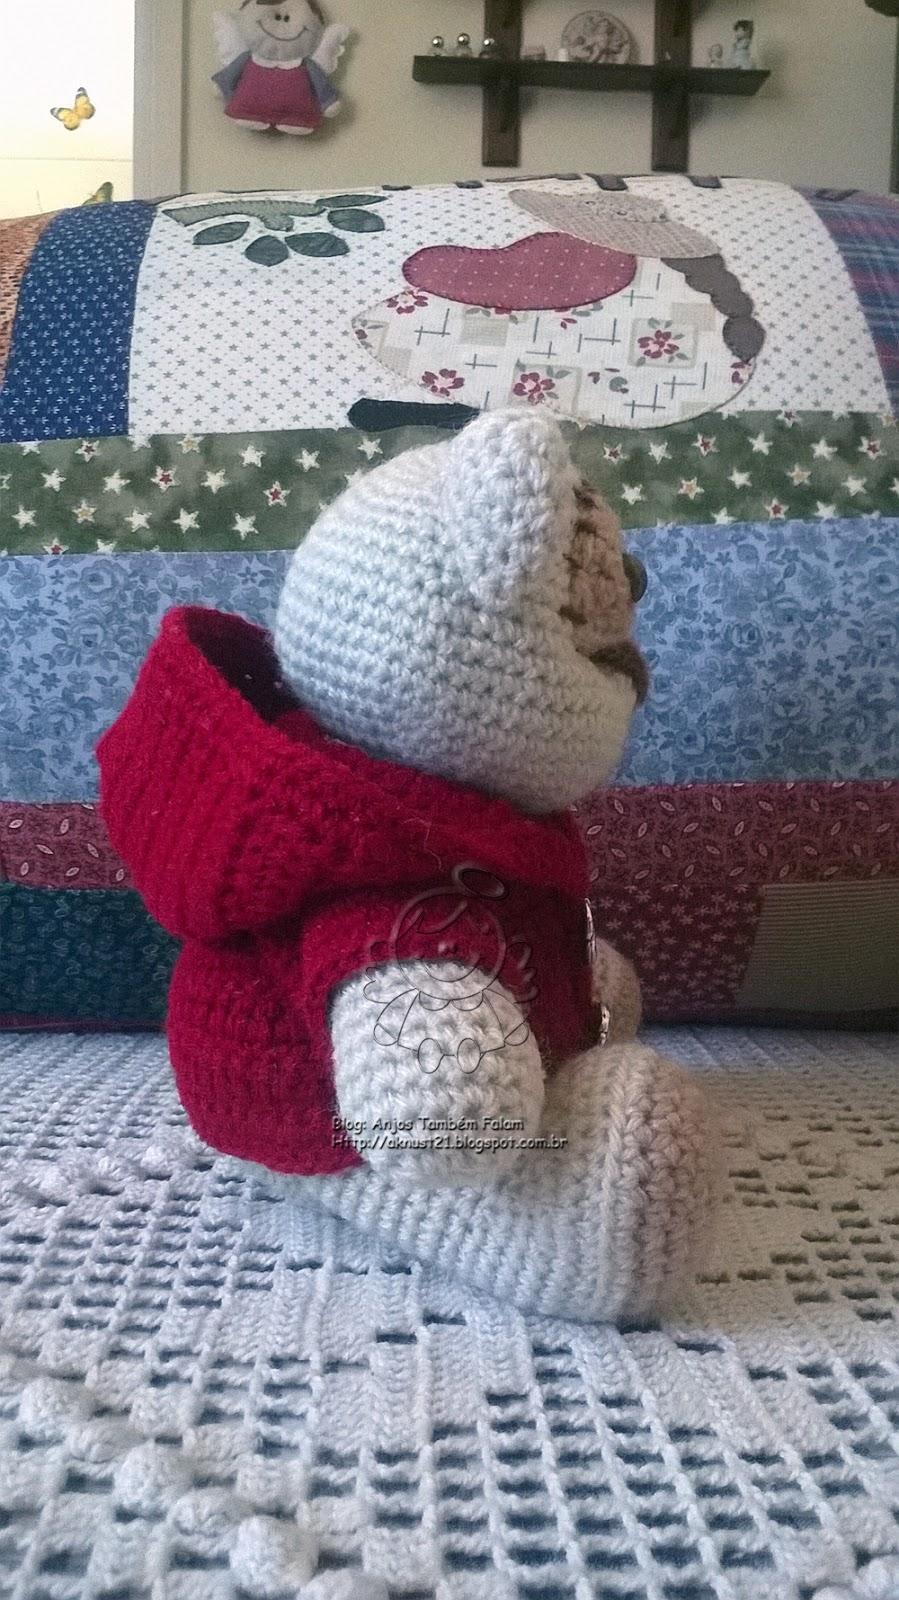 Cuddle Me Bunny amigurumi pattern   Amigurumi pattern, Crochet ...   1600x899